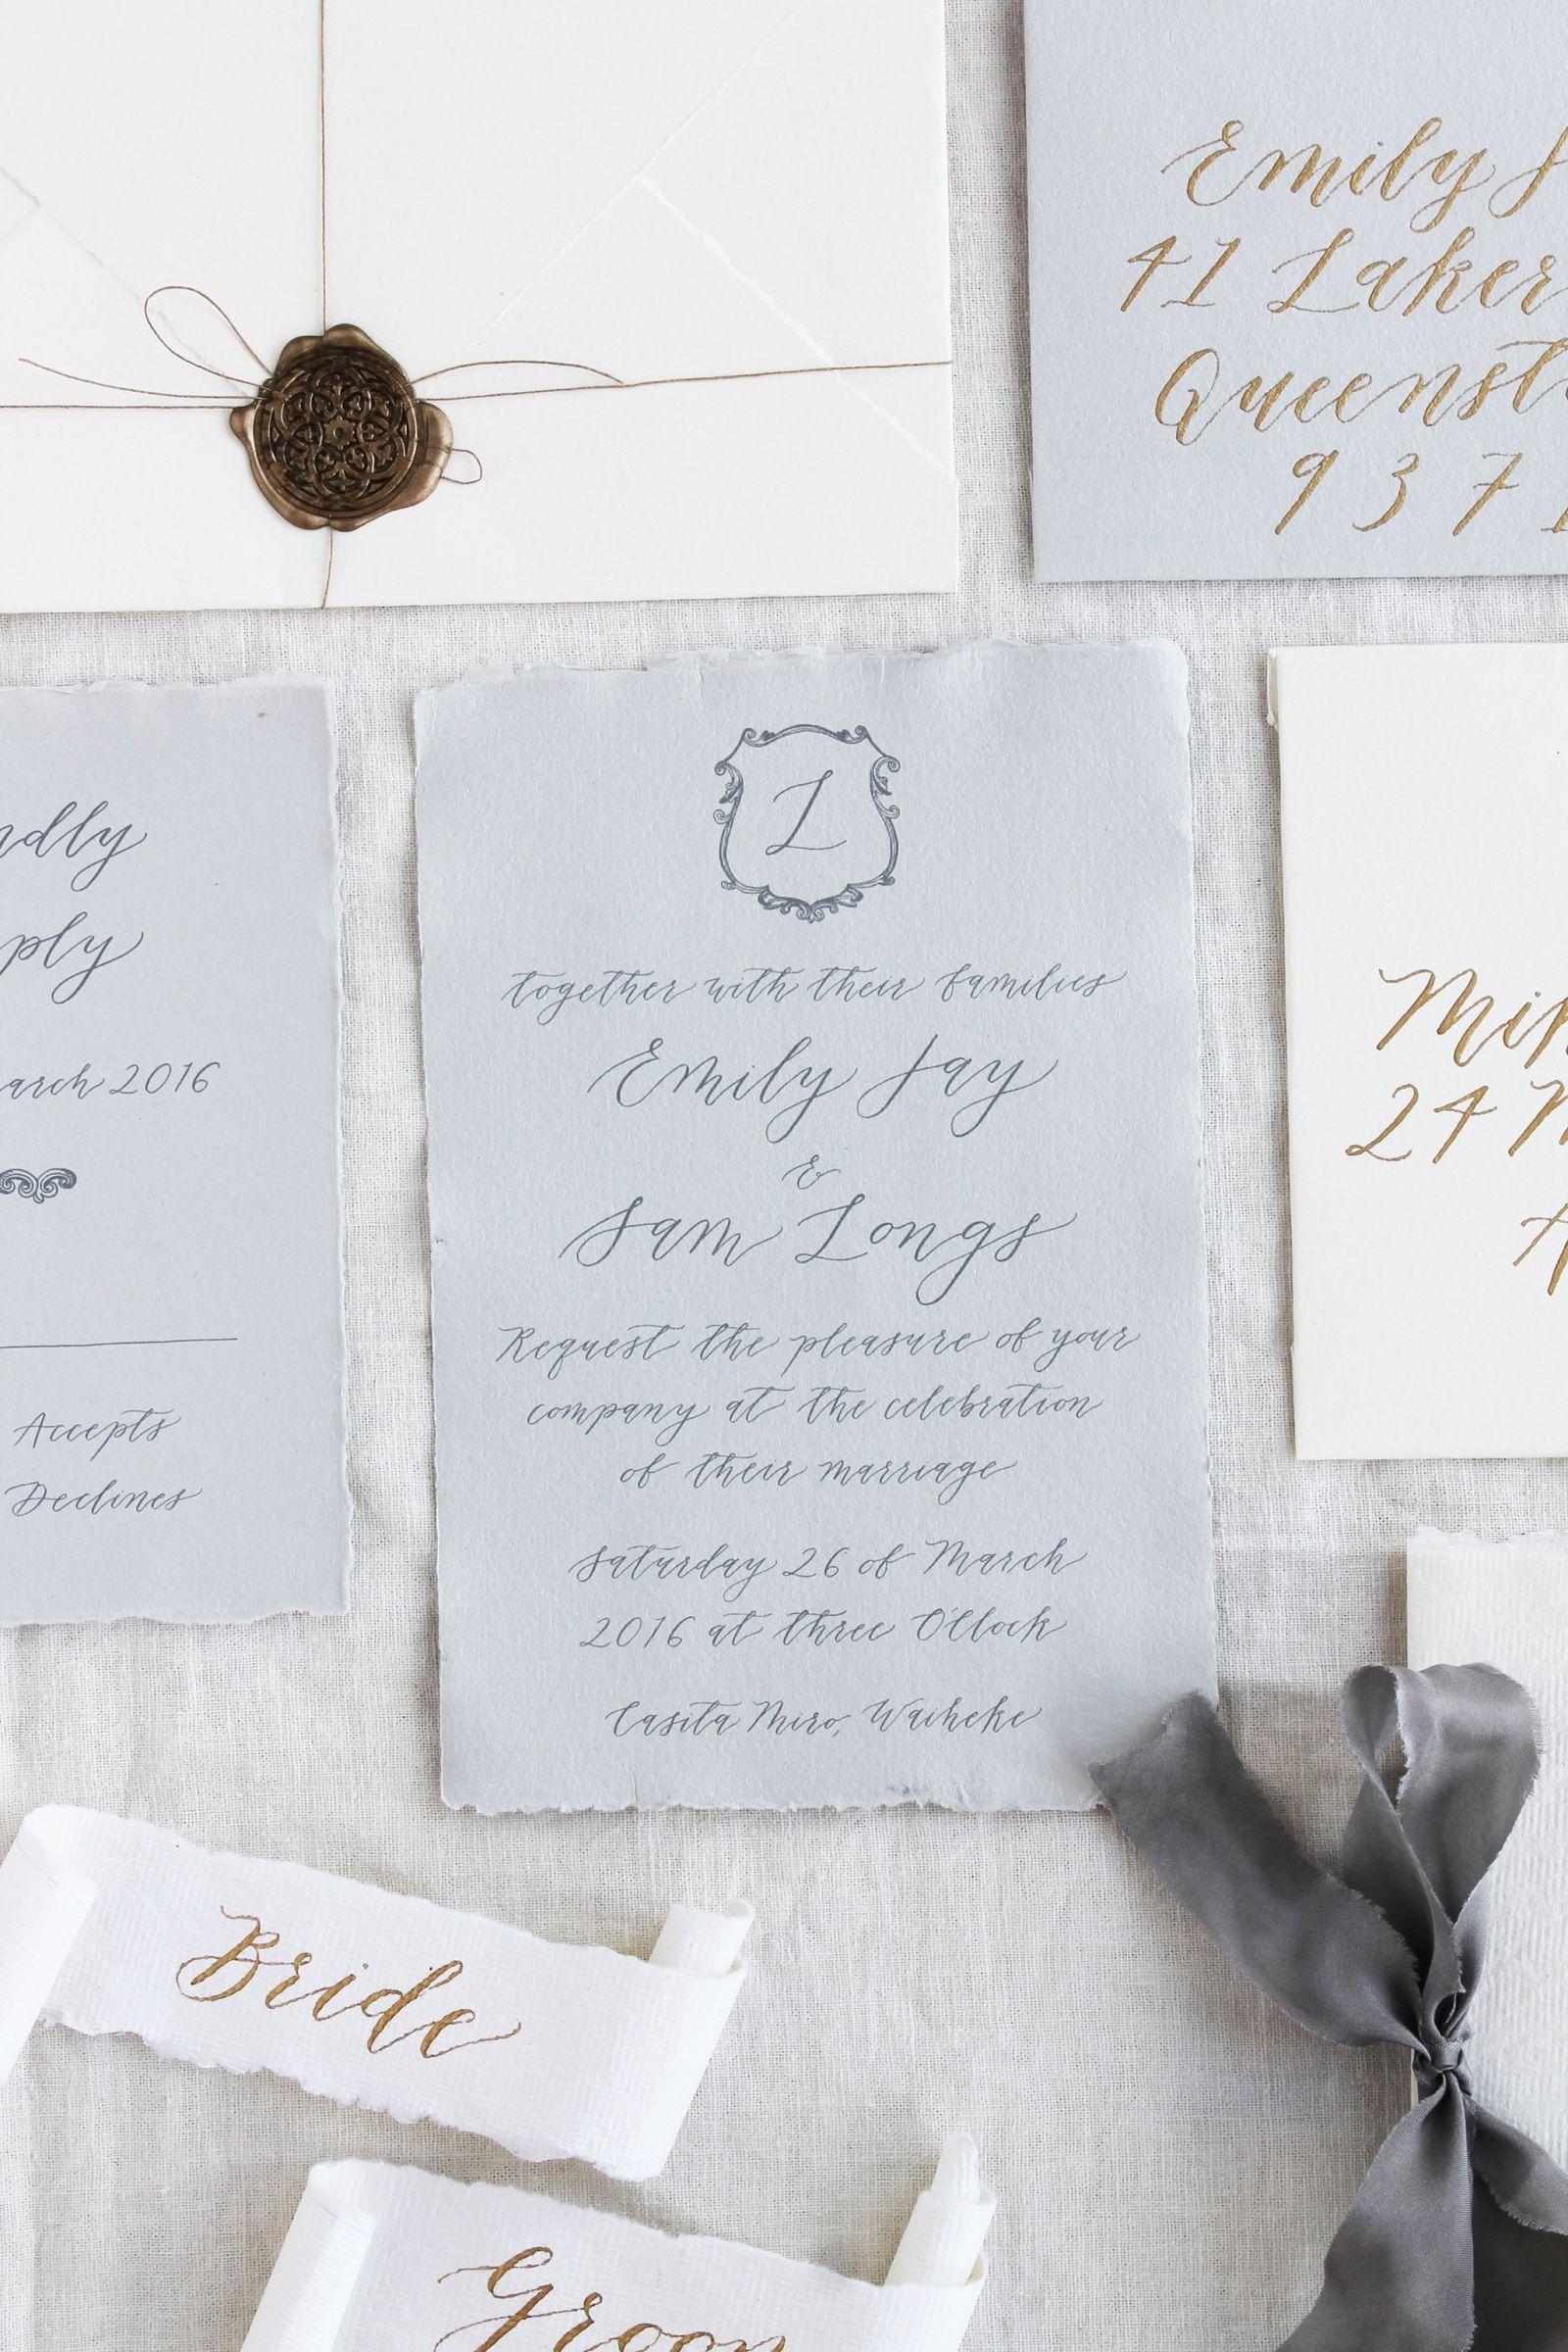 handwrite or print wedding invitation envelopes%0A Michaela McBride Calligraphy via Magnolia Rouge